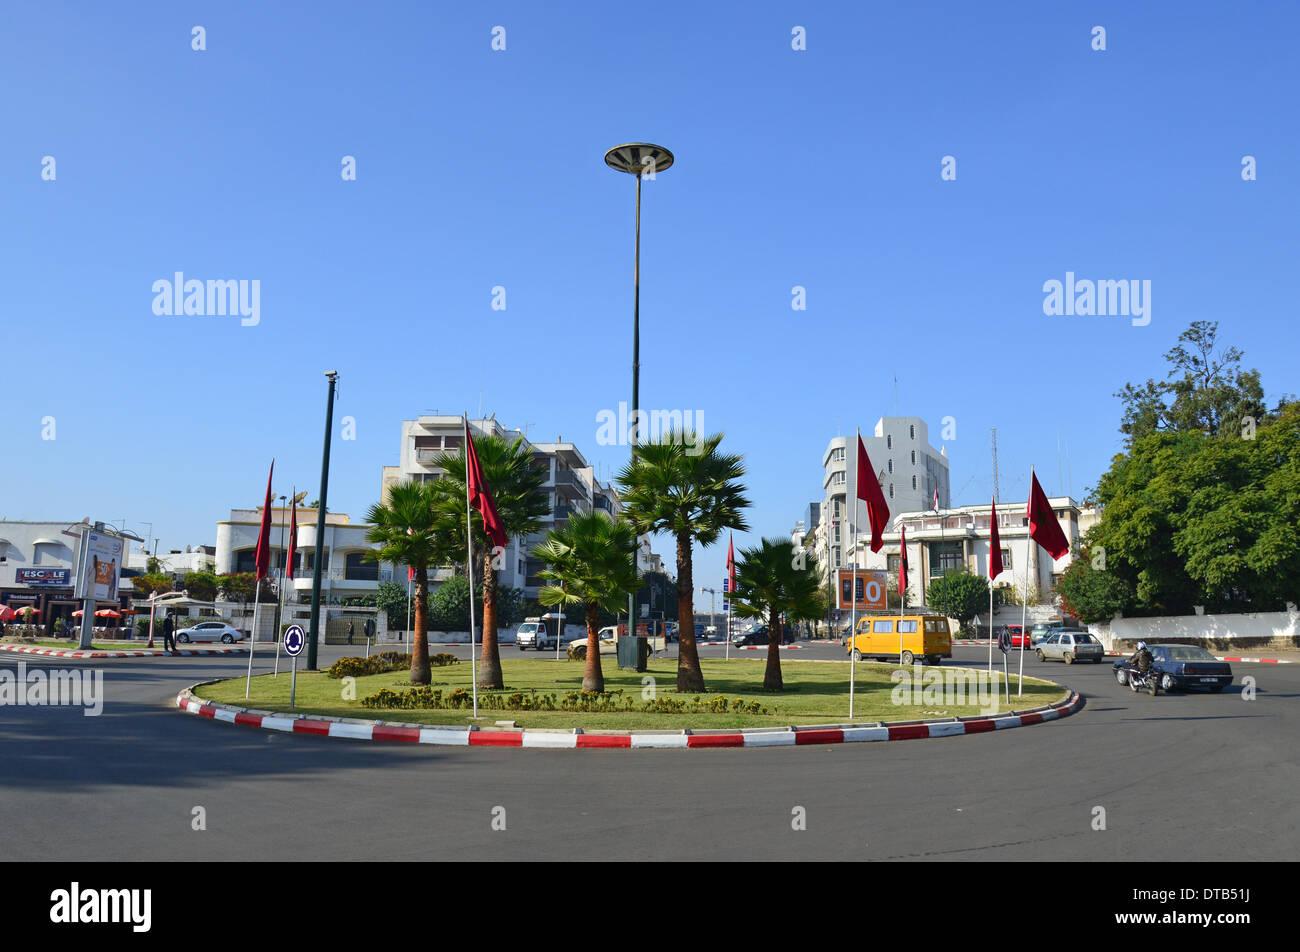 City roundabout, Rabat, Rabat-Salé-Zemmour-Zaer Region, Kingdom of Morocco - Stock Image